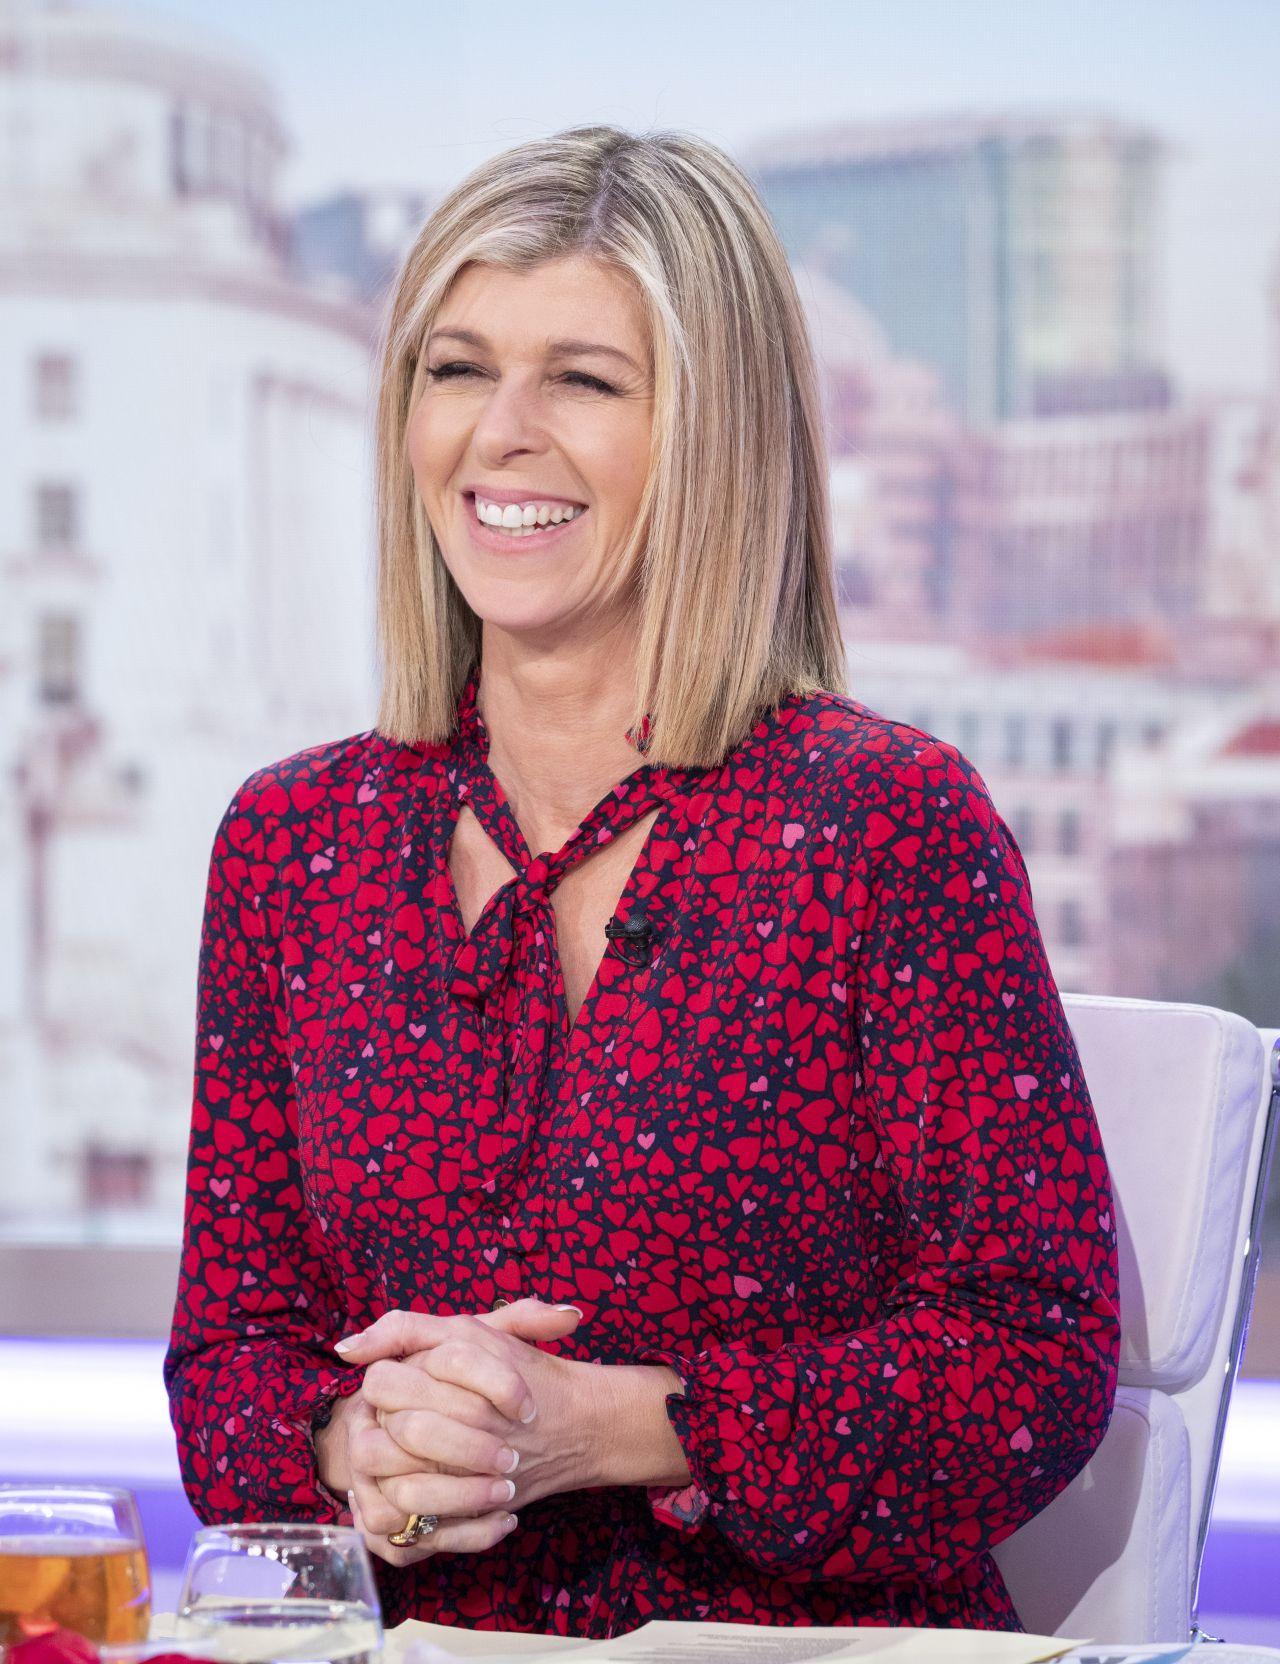 Kate Garraway returns to Good Morning Britain in beautiful